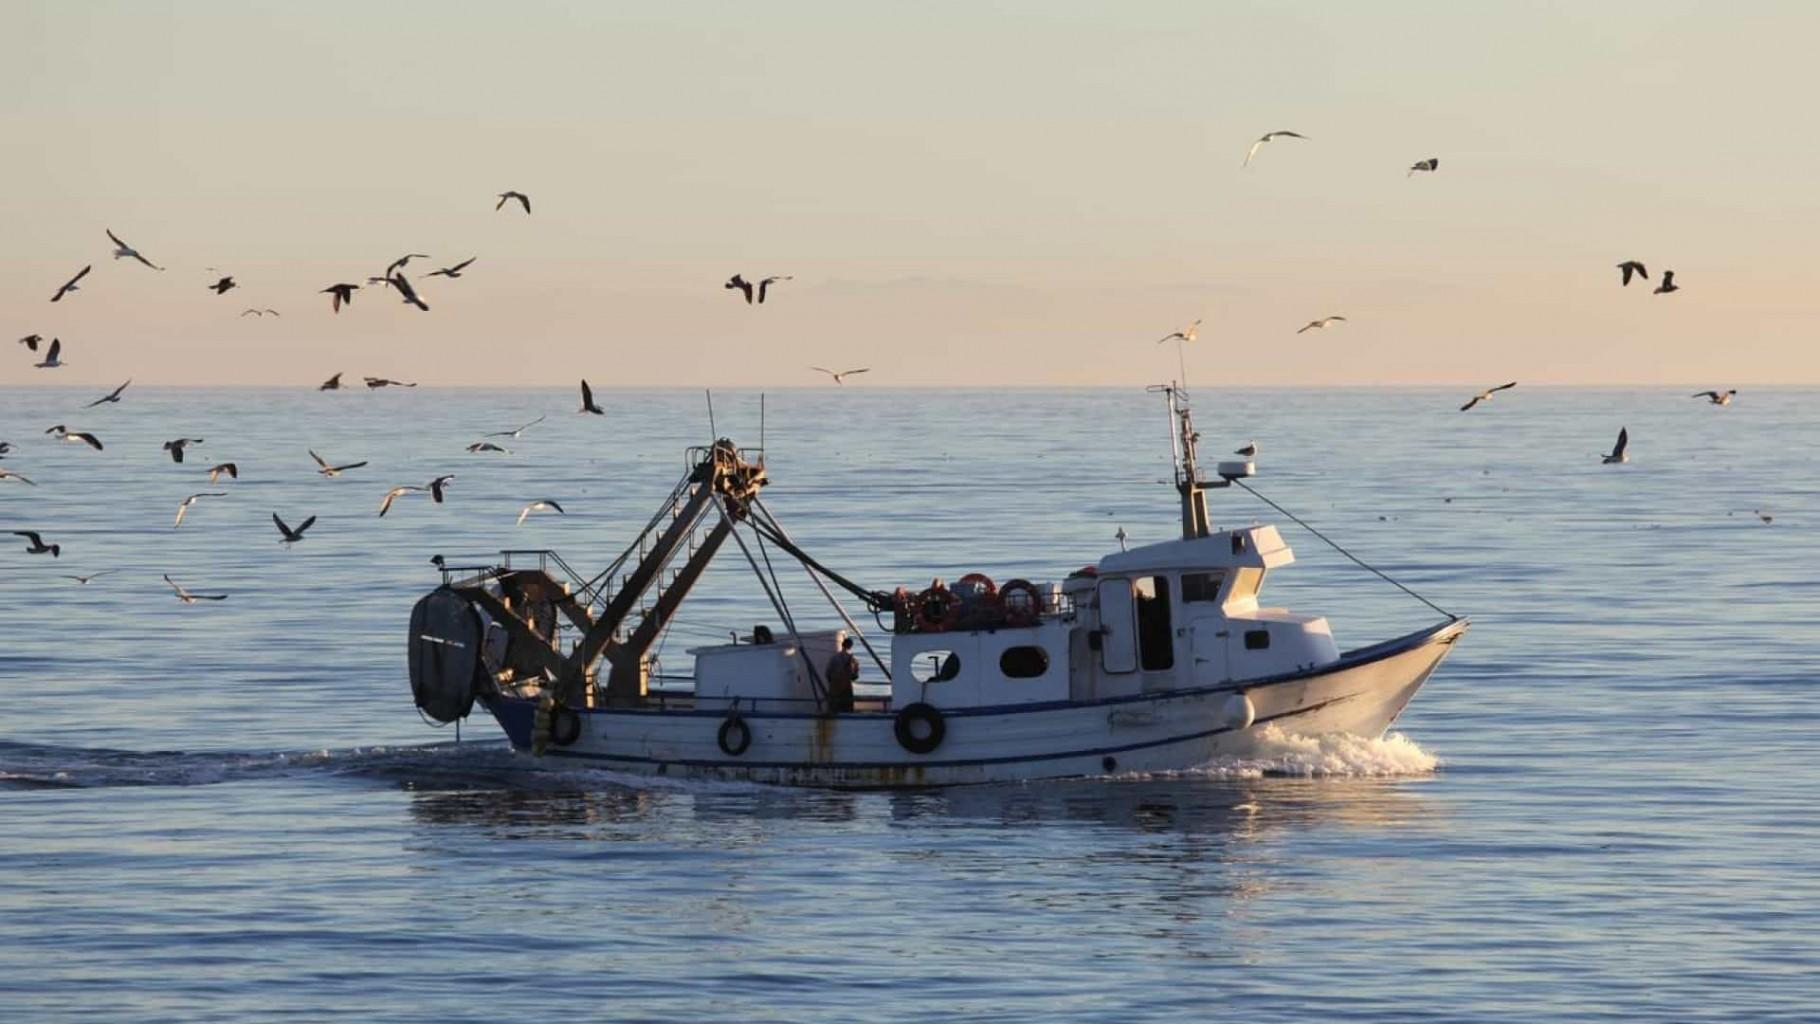 Vinte e oito pescadores de Viana do Castelo recebem 500 mil euros por parque eólico